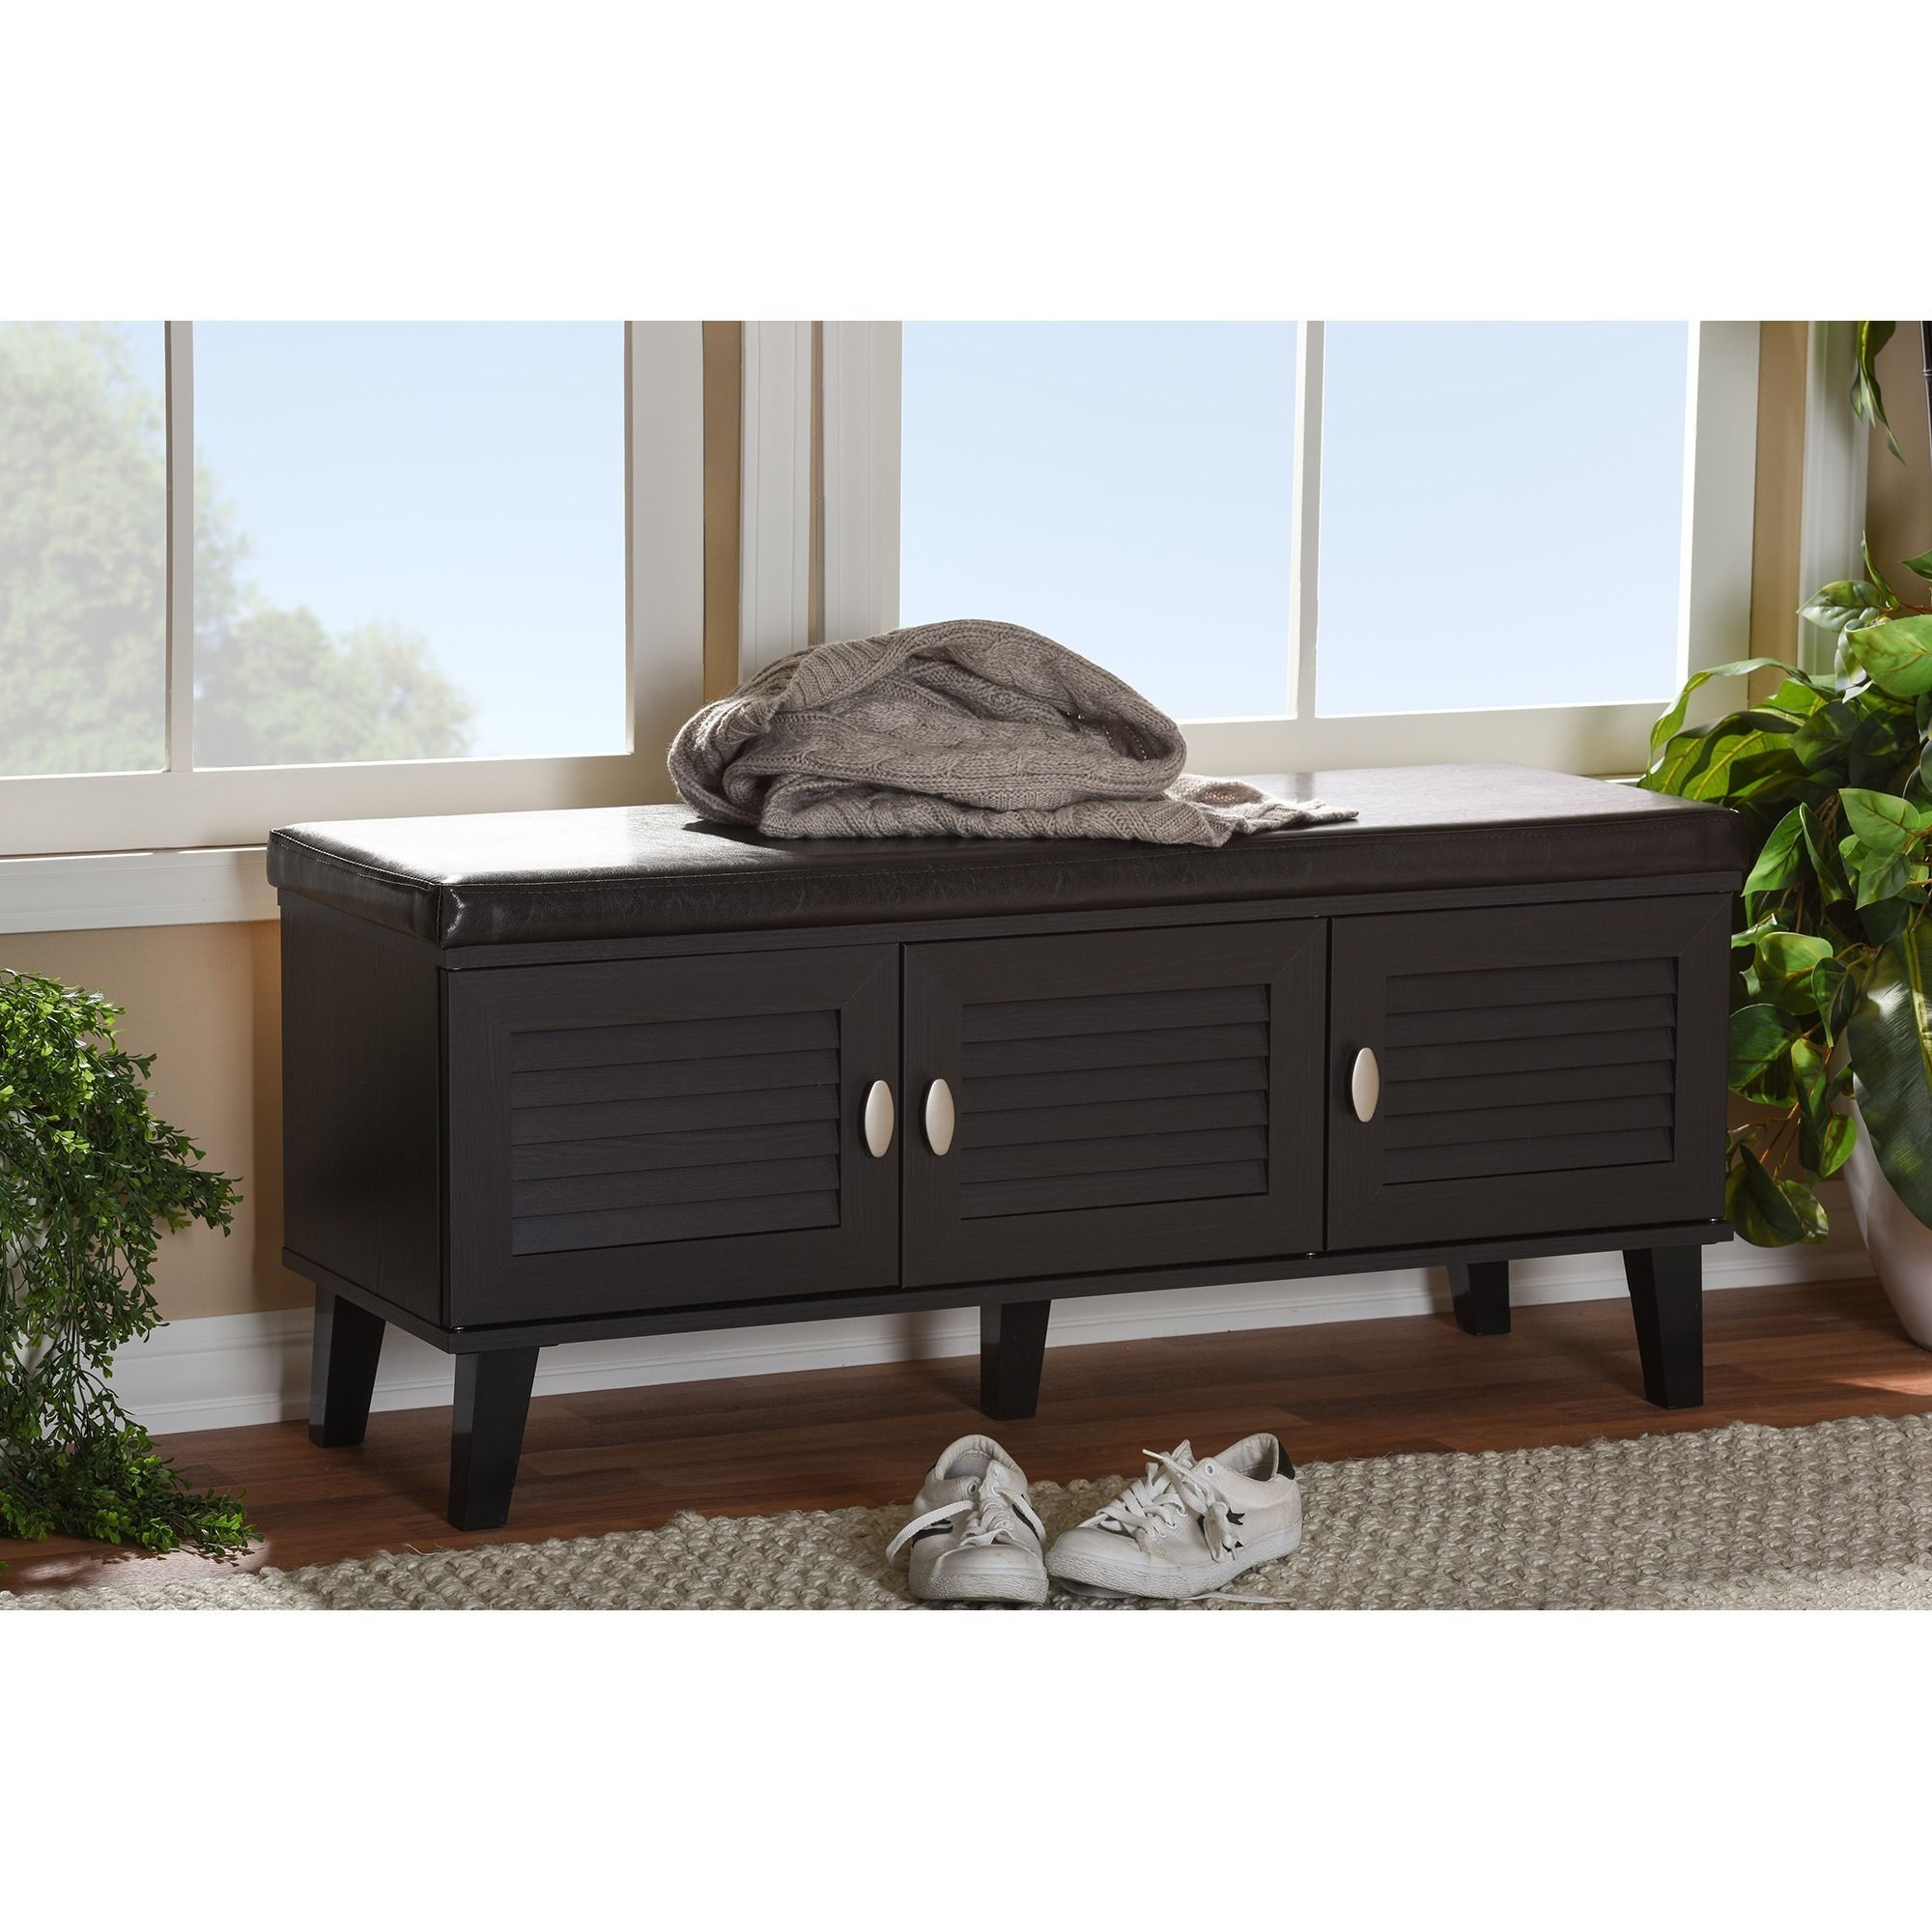 wicker ideas portrait of furniture home box storage cabinet design entryway sensational